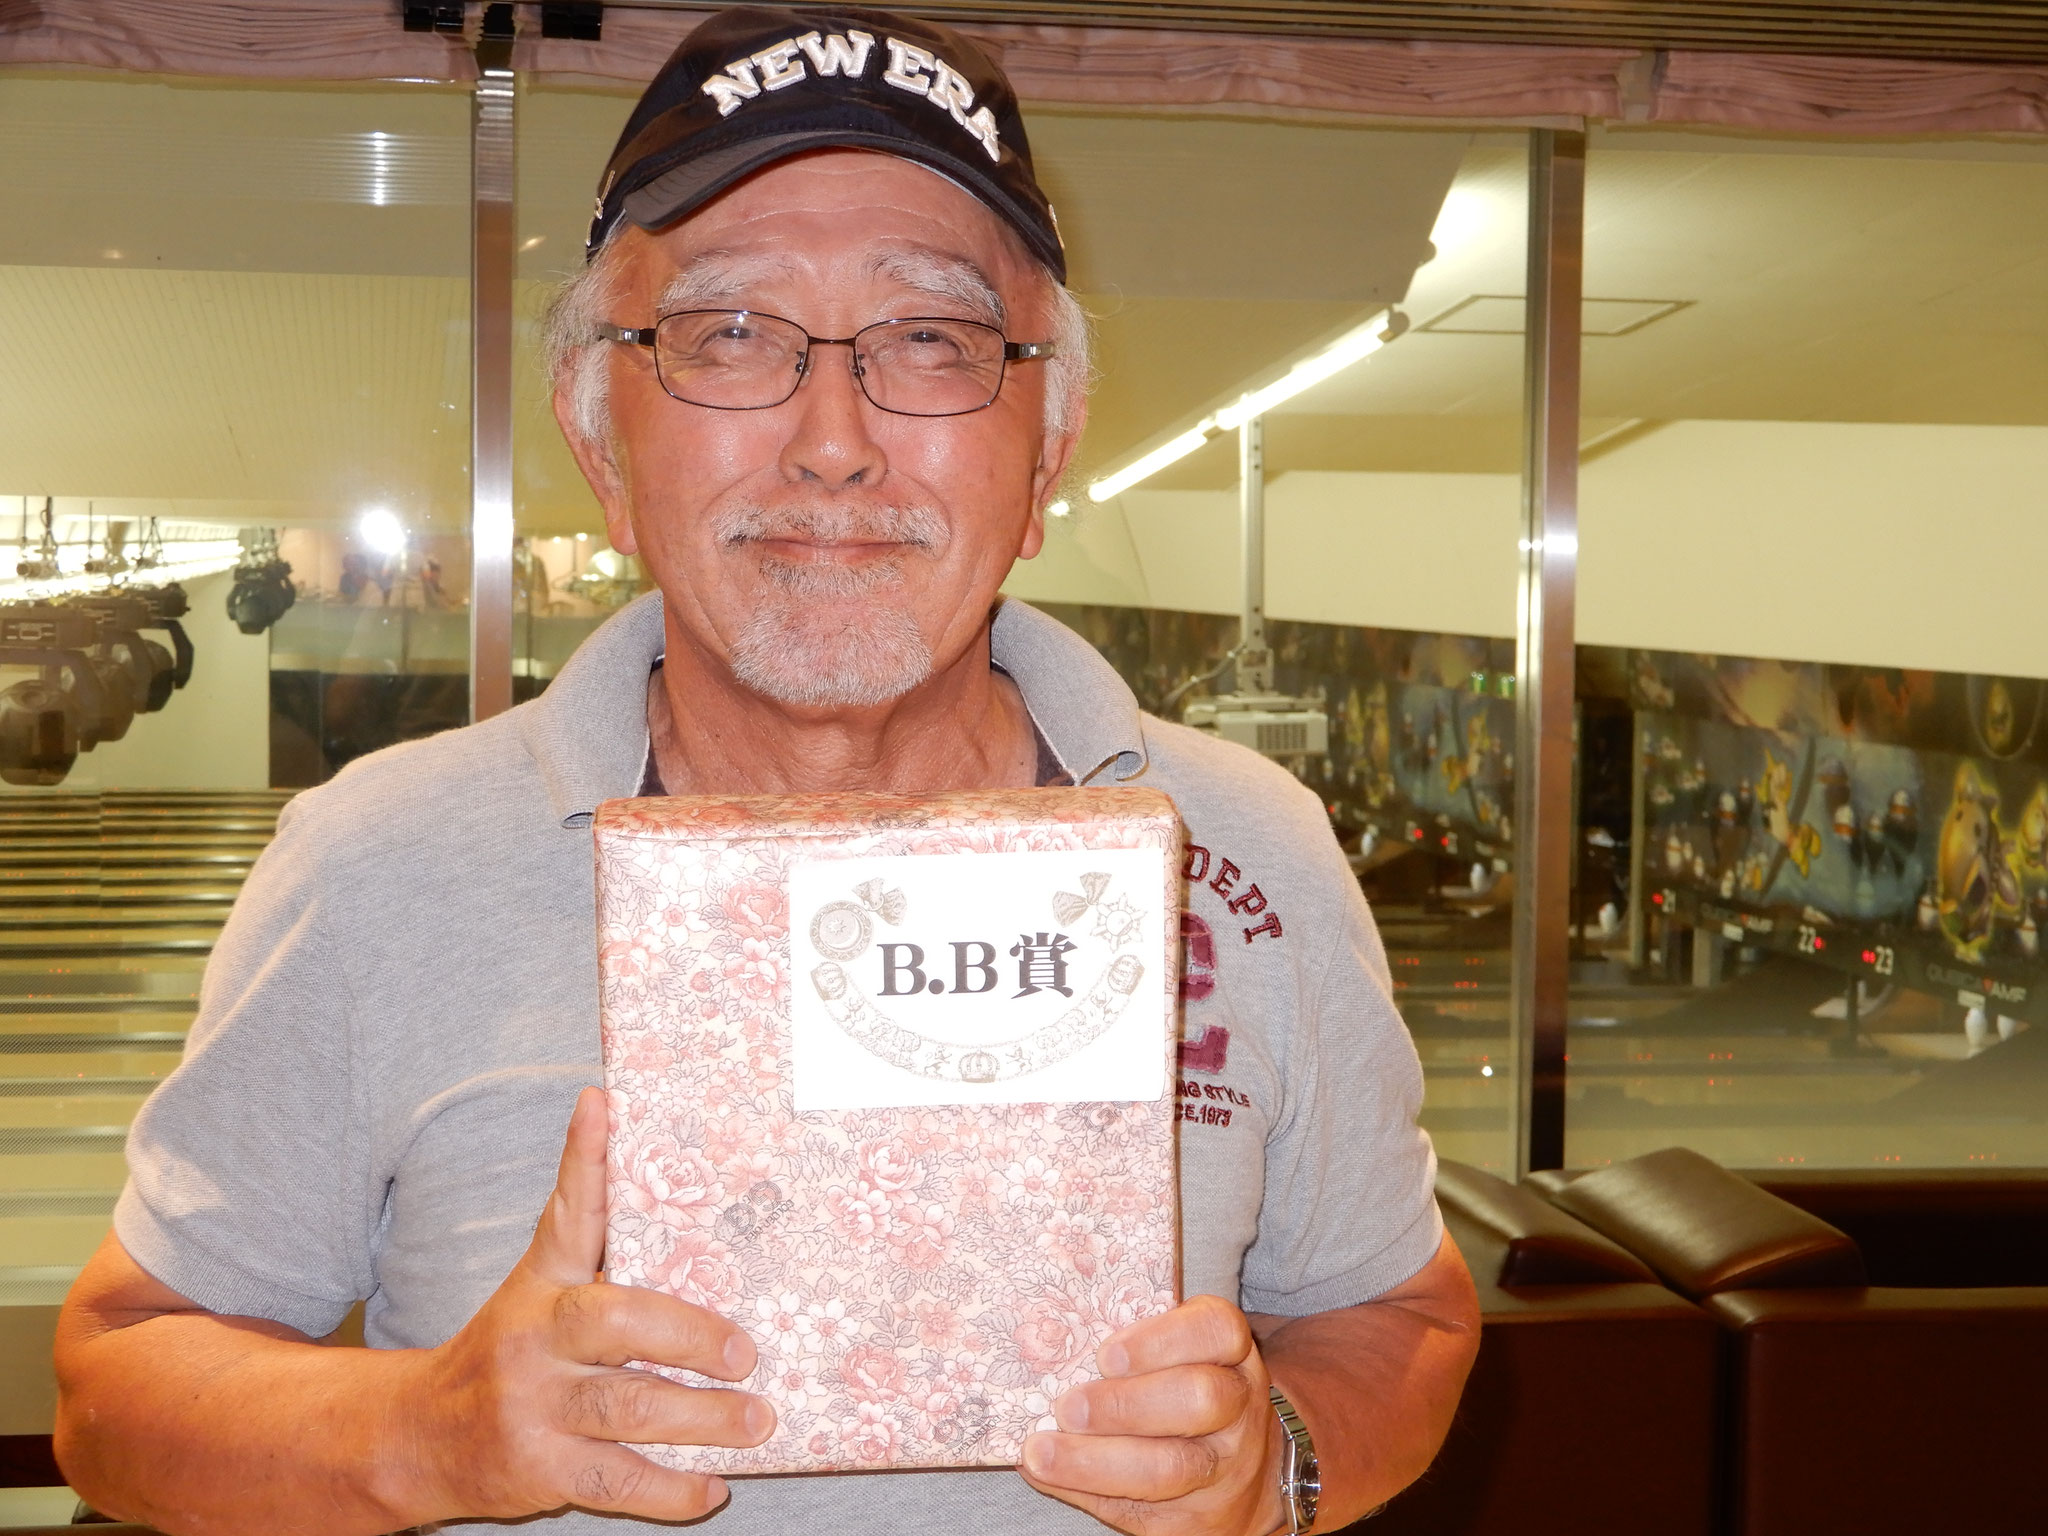 BB: <田中征彦>名誉あるブリジット・バルドーでした。